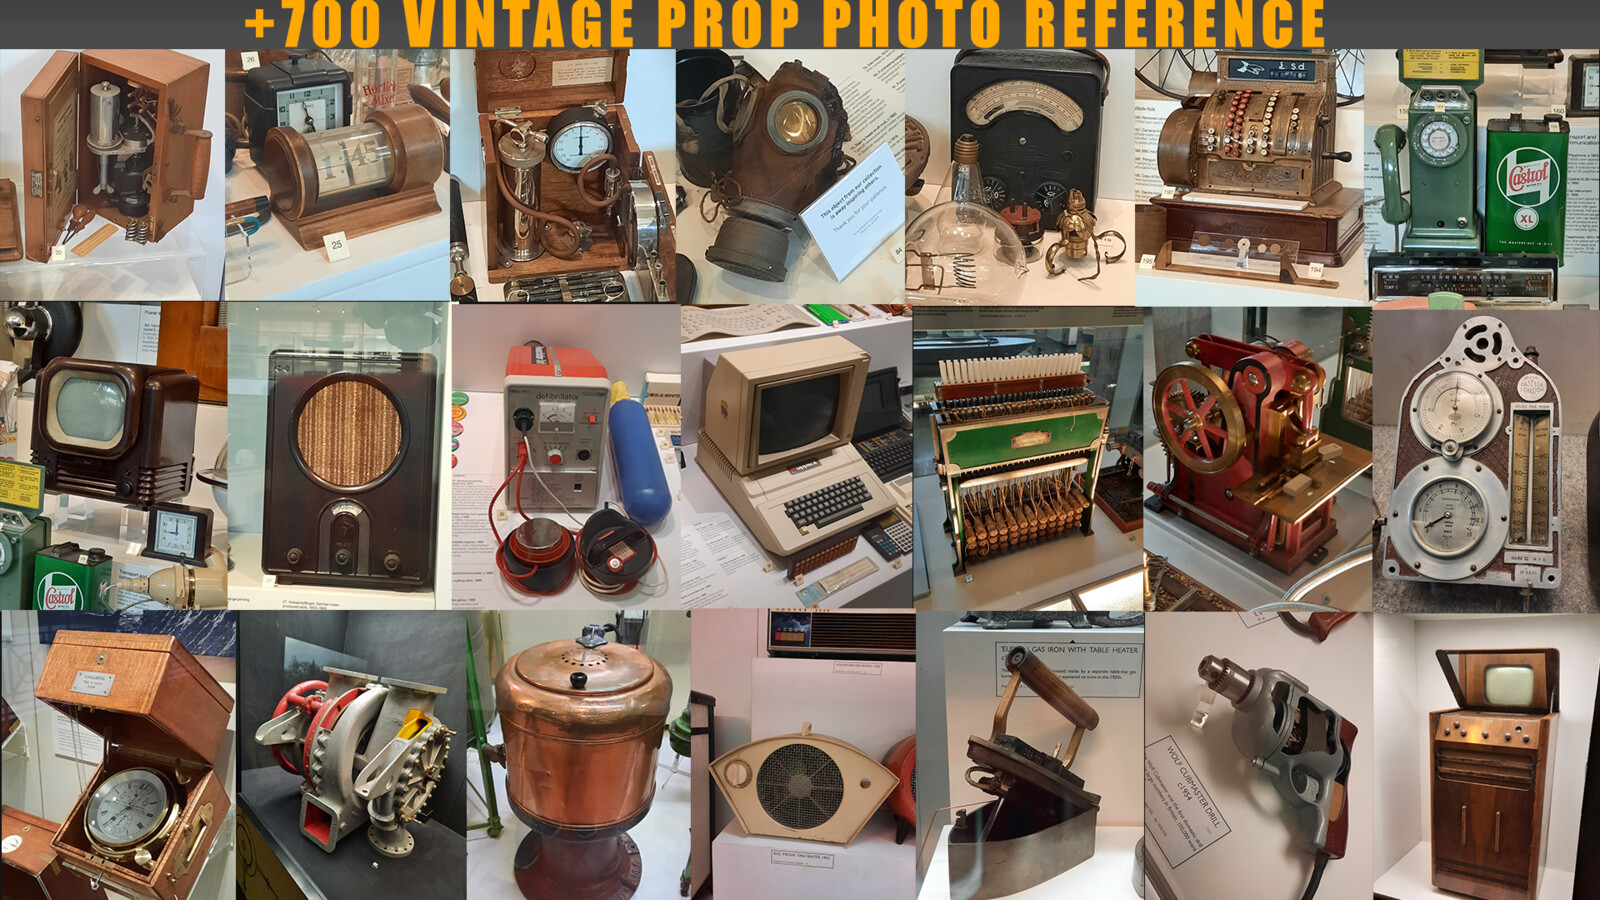 +700 Vintage prop photo reference